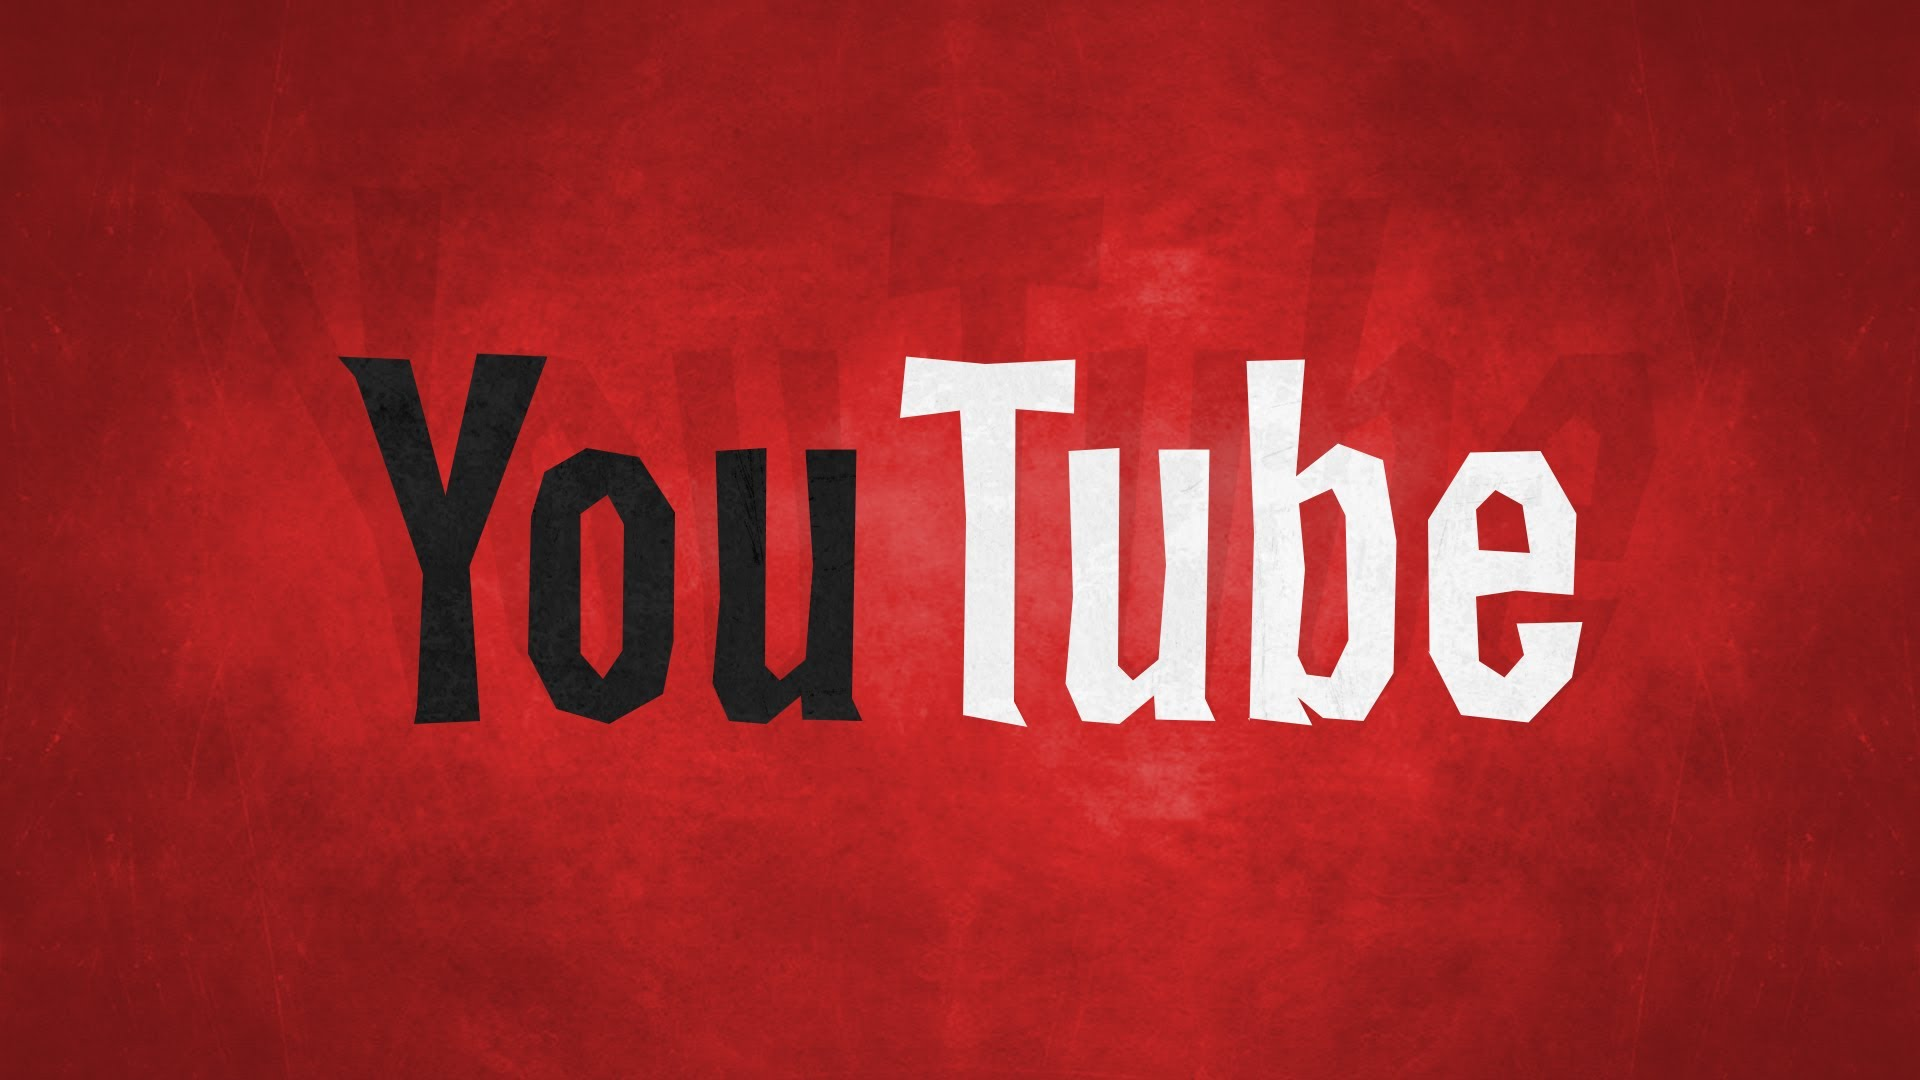 buy youtube comments uk